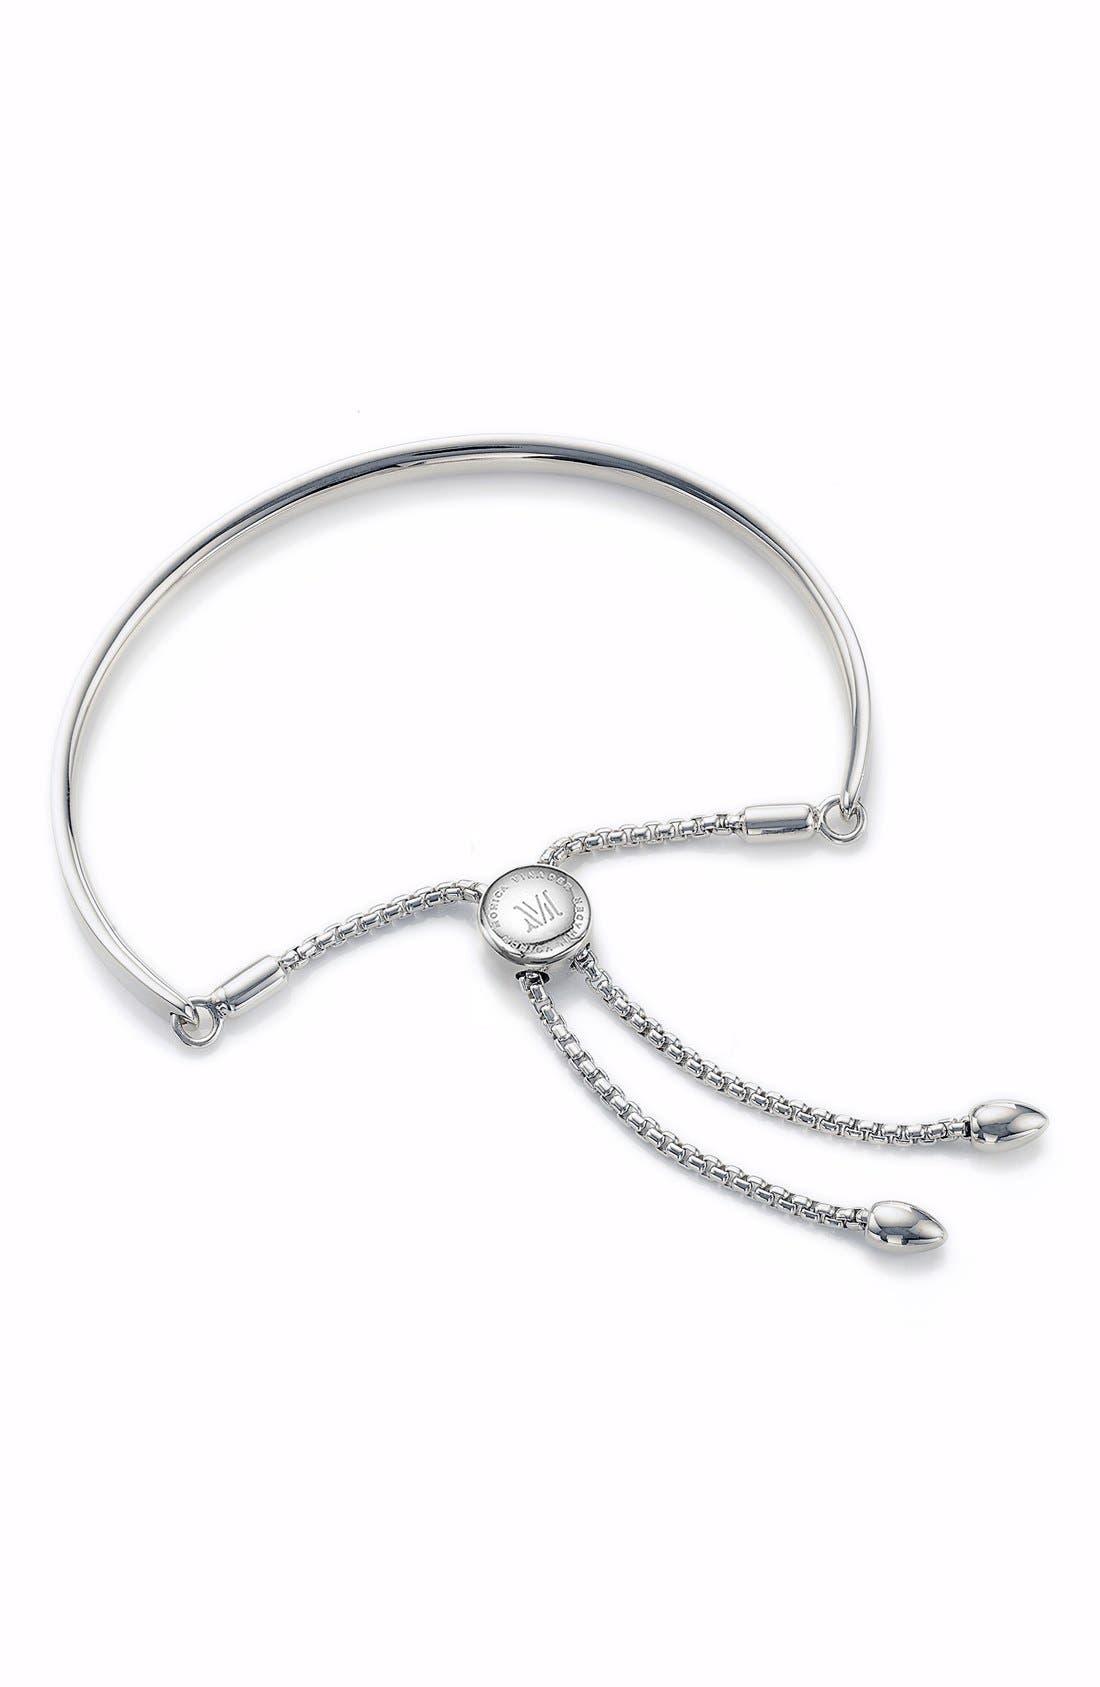 Monica Vinader Fiji Petite Friendship Bracelet